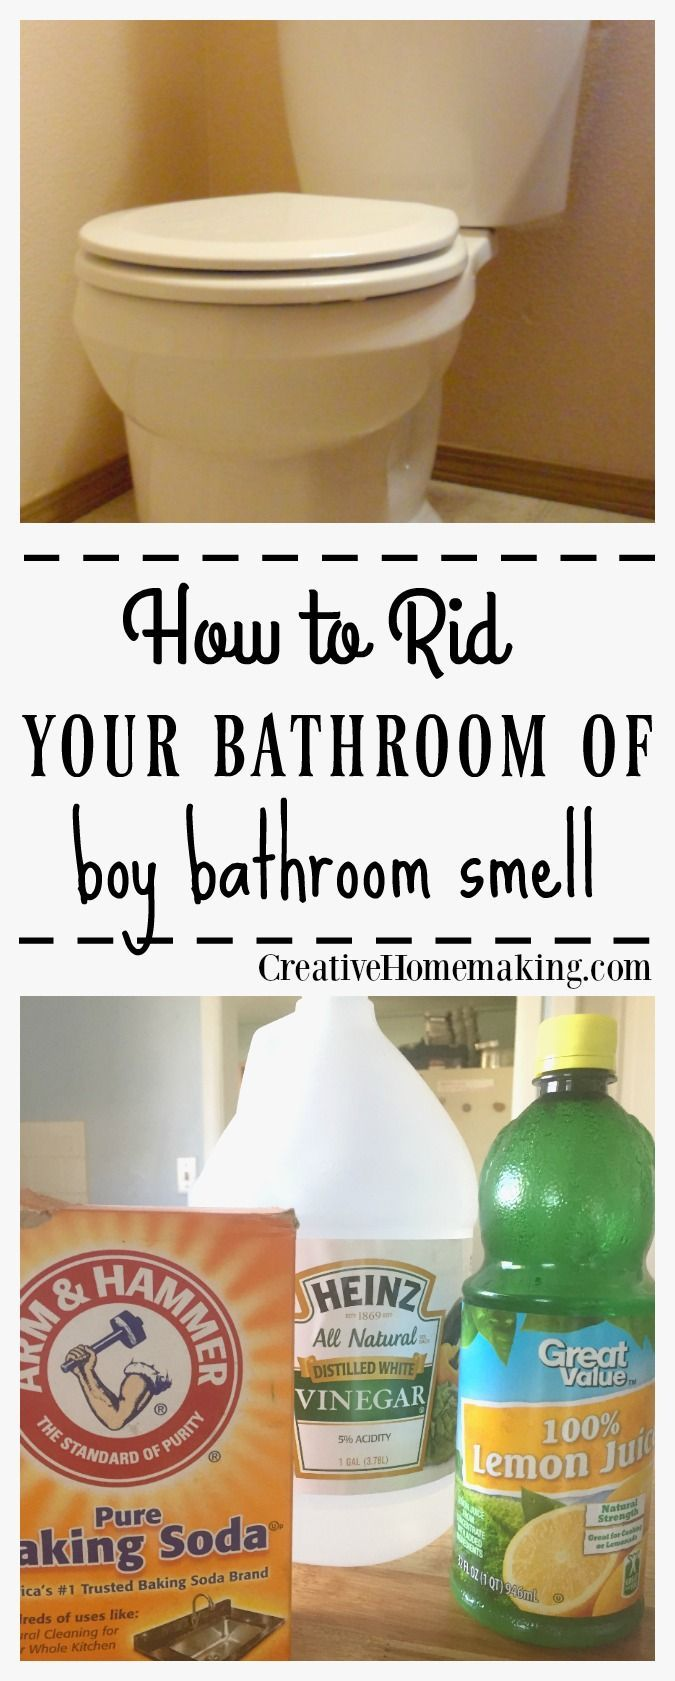 Easy DIY tip for ridding your bathroom of the dreaded 'boy bathroom smell'. #cleaningtips #bathroom #springcleaning